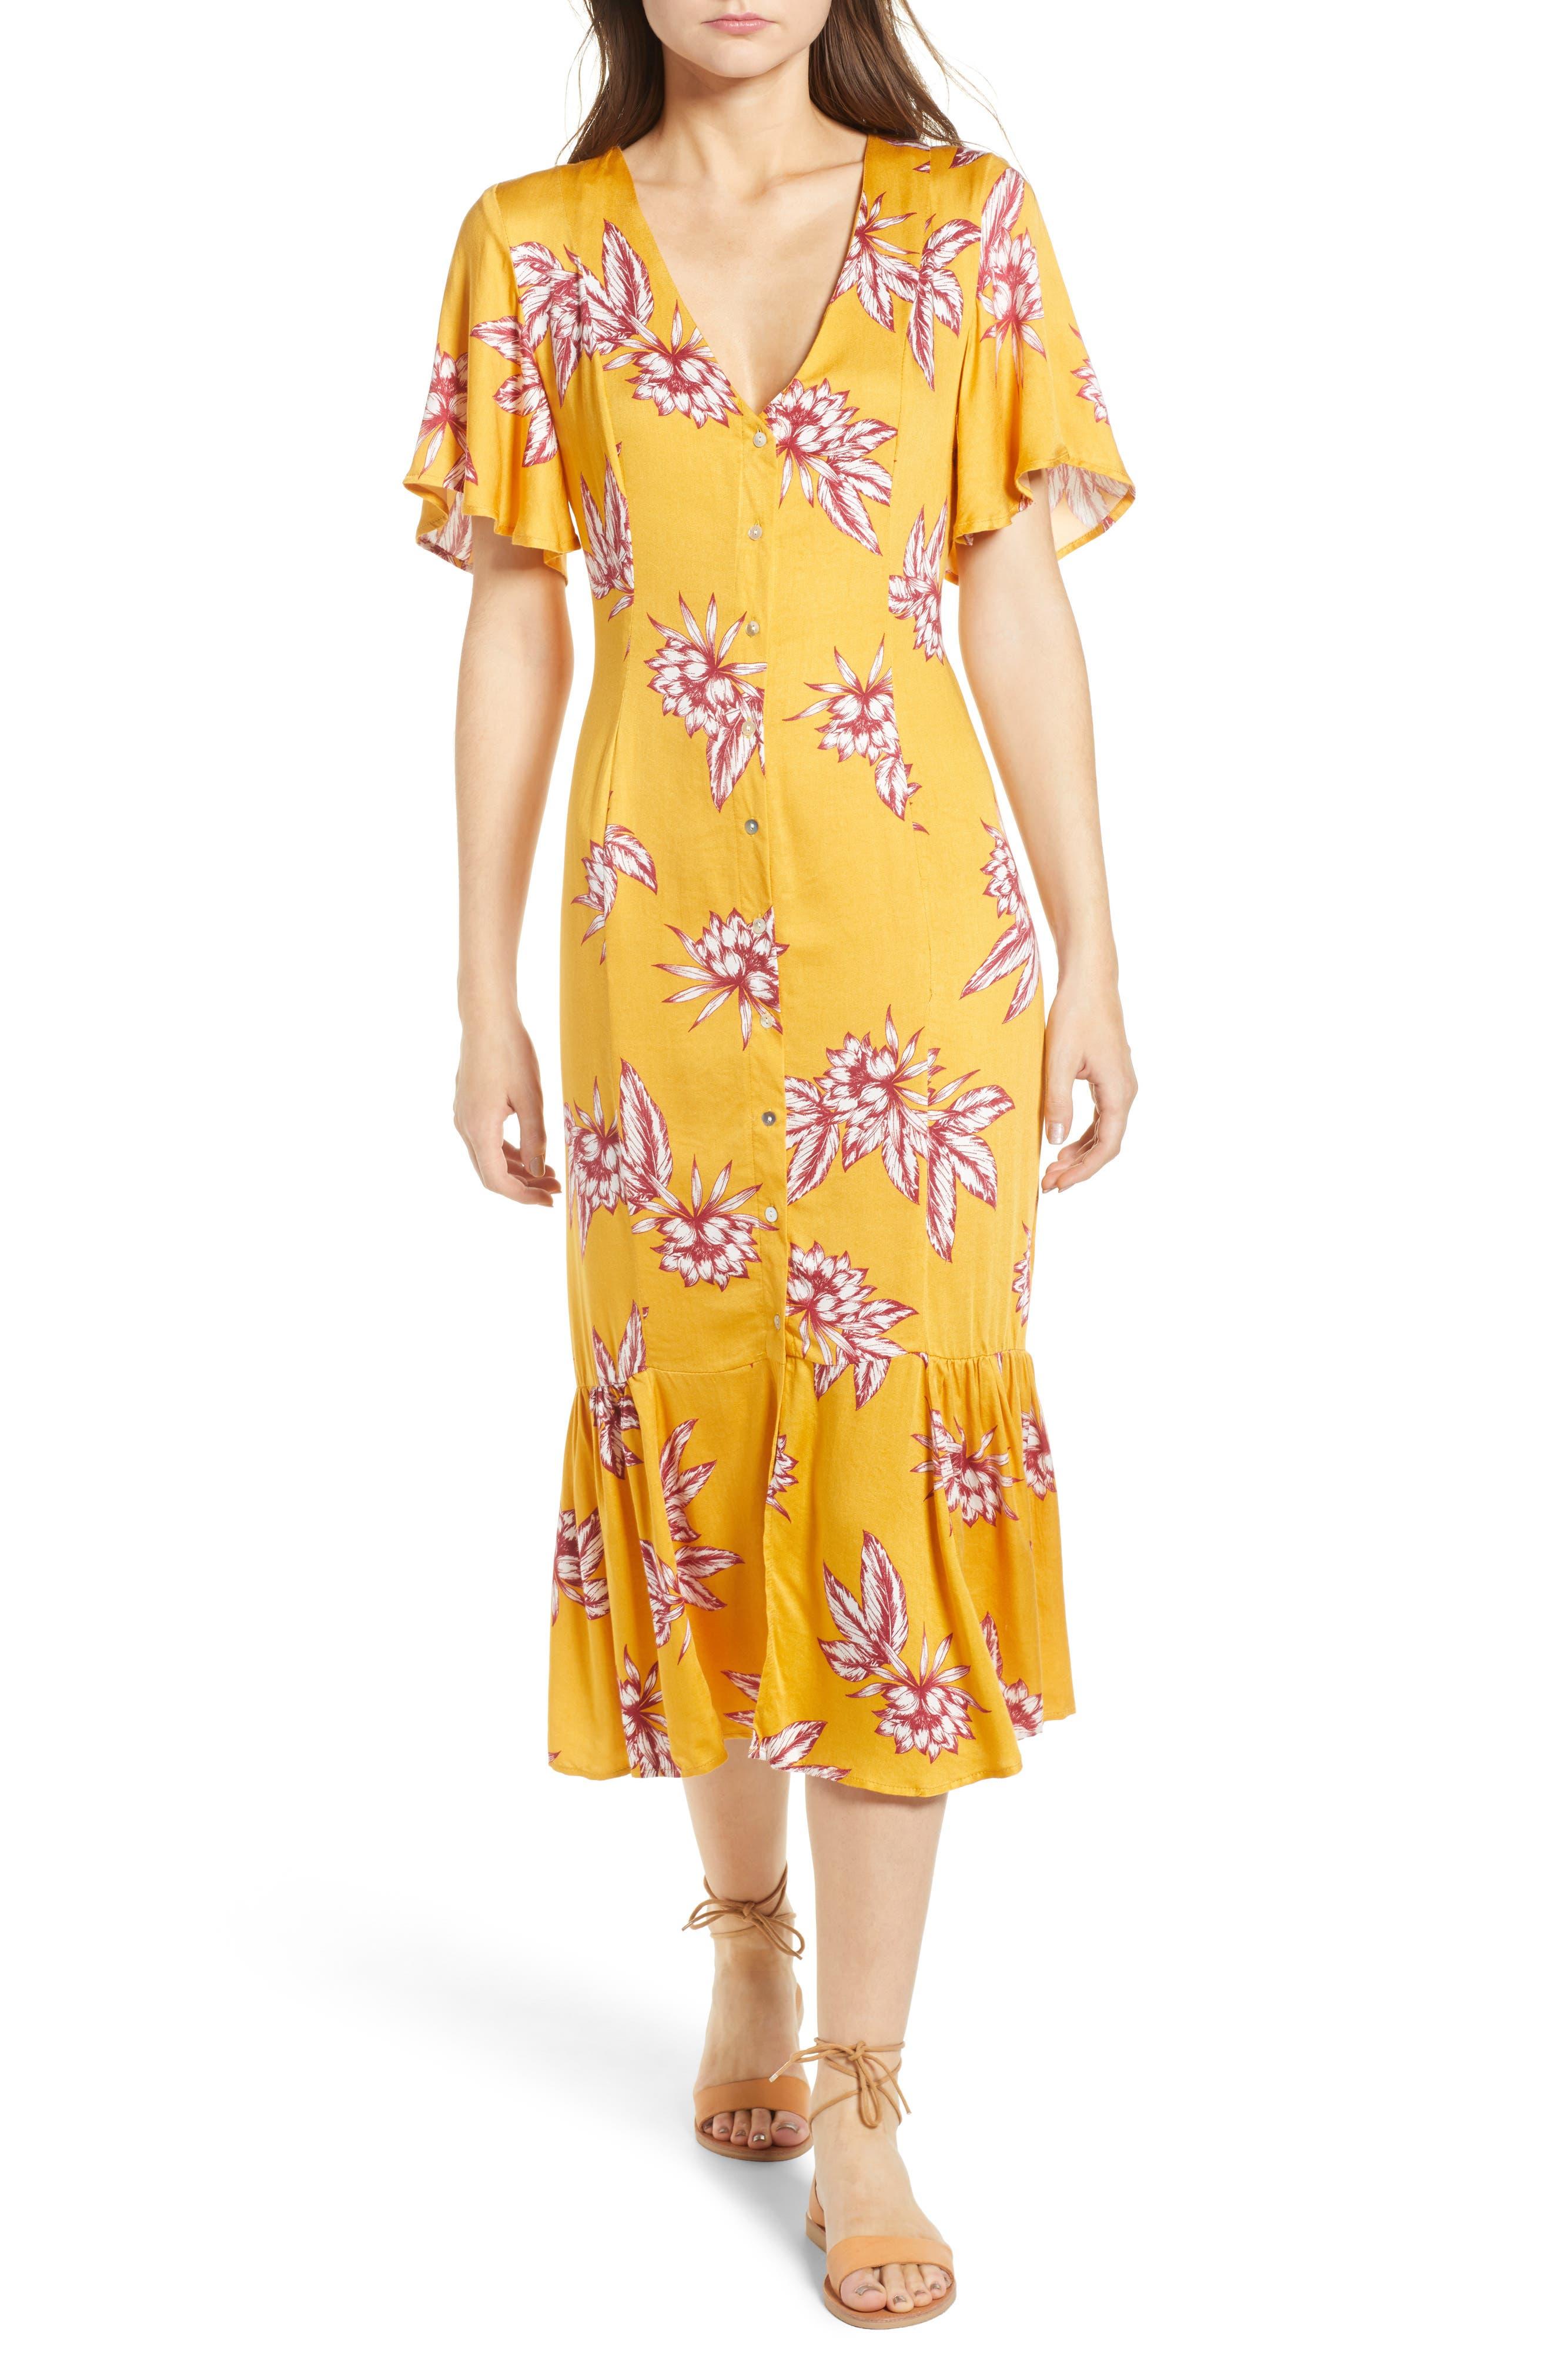 Searing Soul Midi Dress,                         Main,                         color, 701